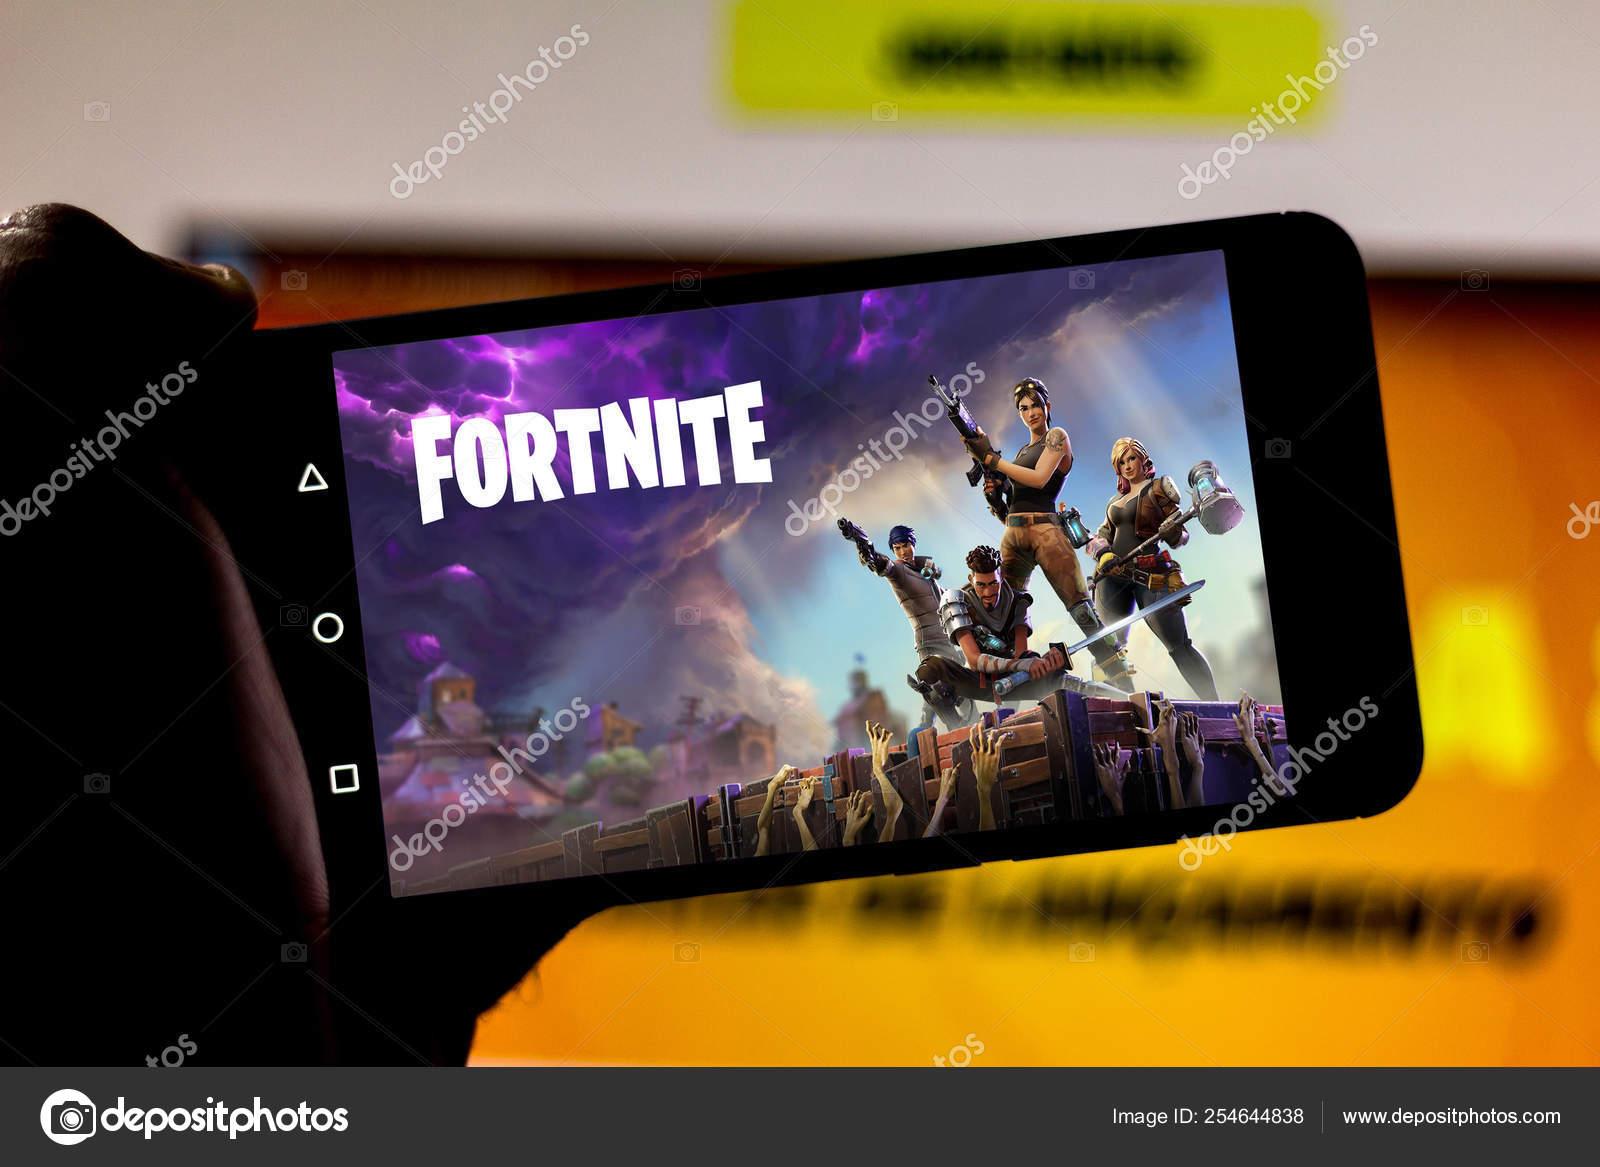 fortnite download mobile epic games